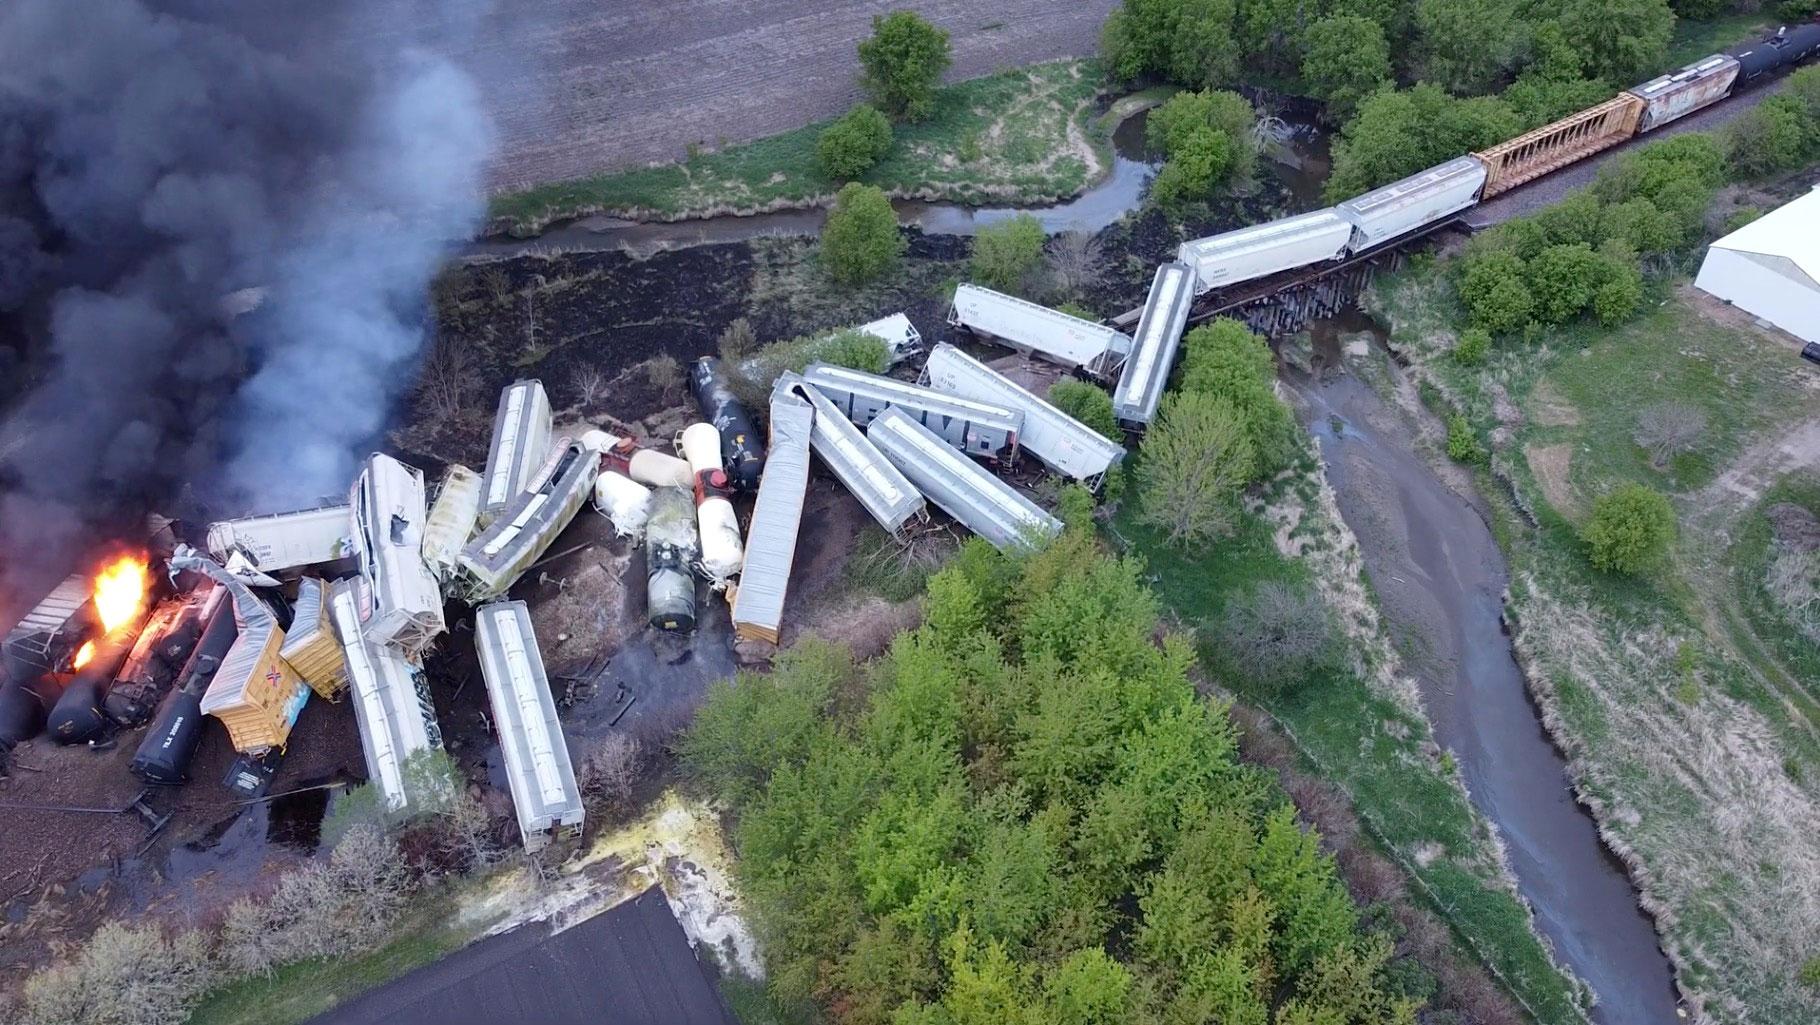 Train derailment and fire prompts evacuations in northwest Iowa